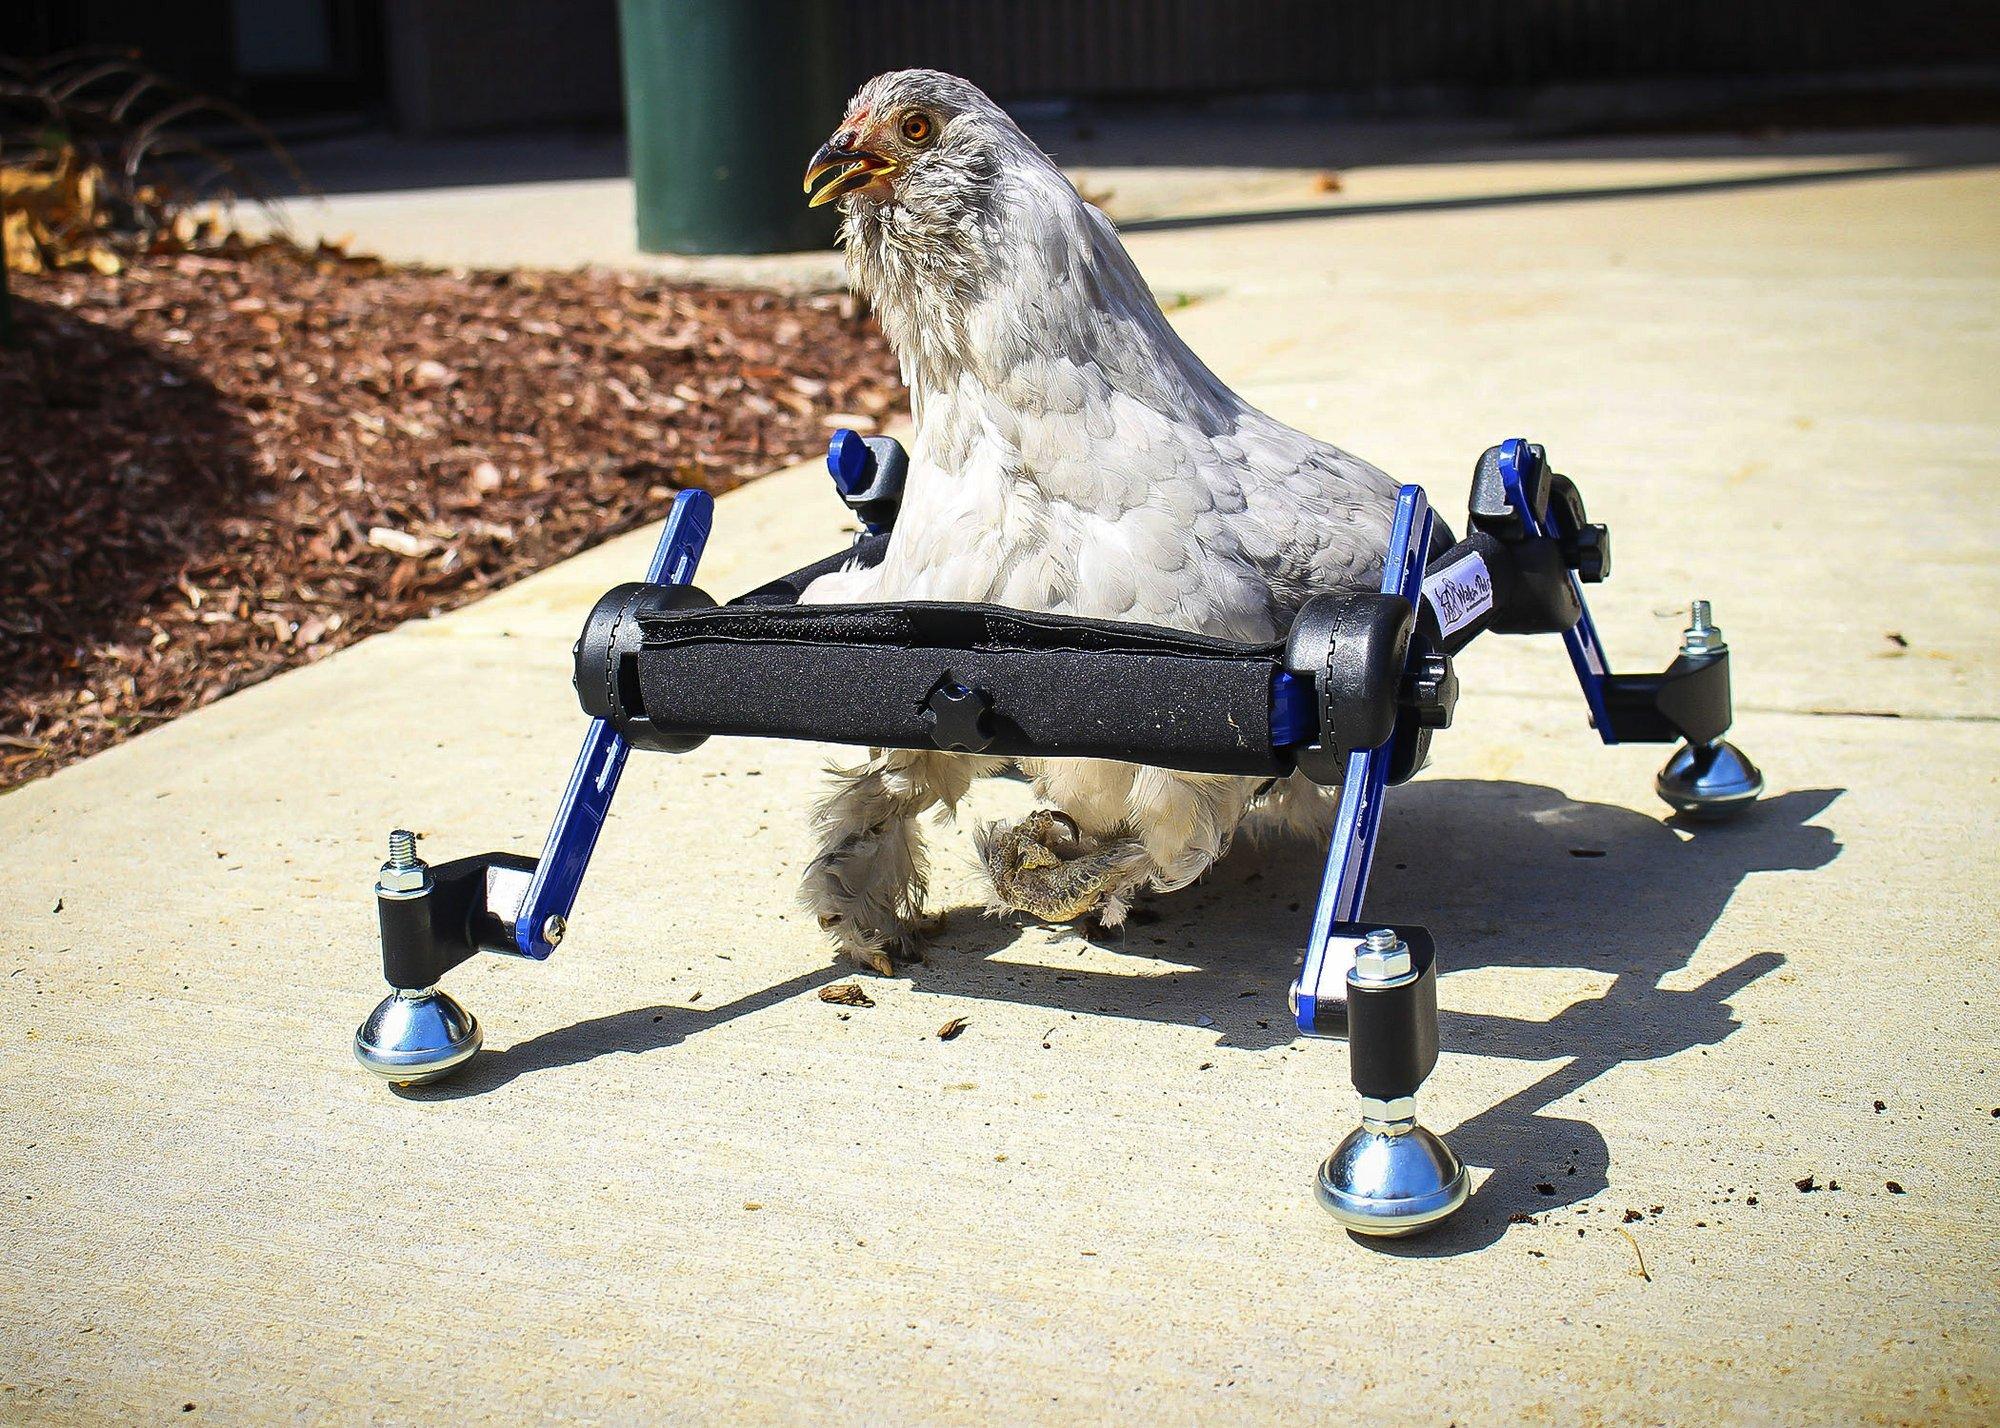 Disabeld pet chicken_1555095058357.jpg